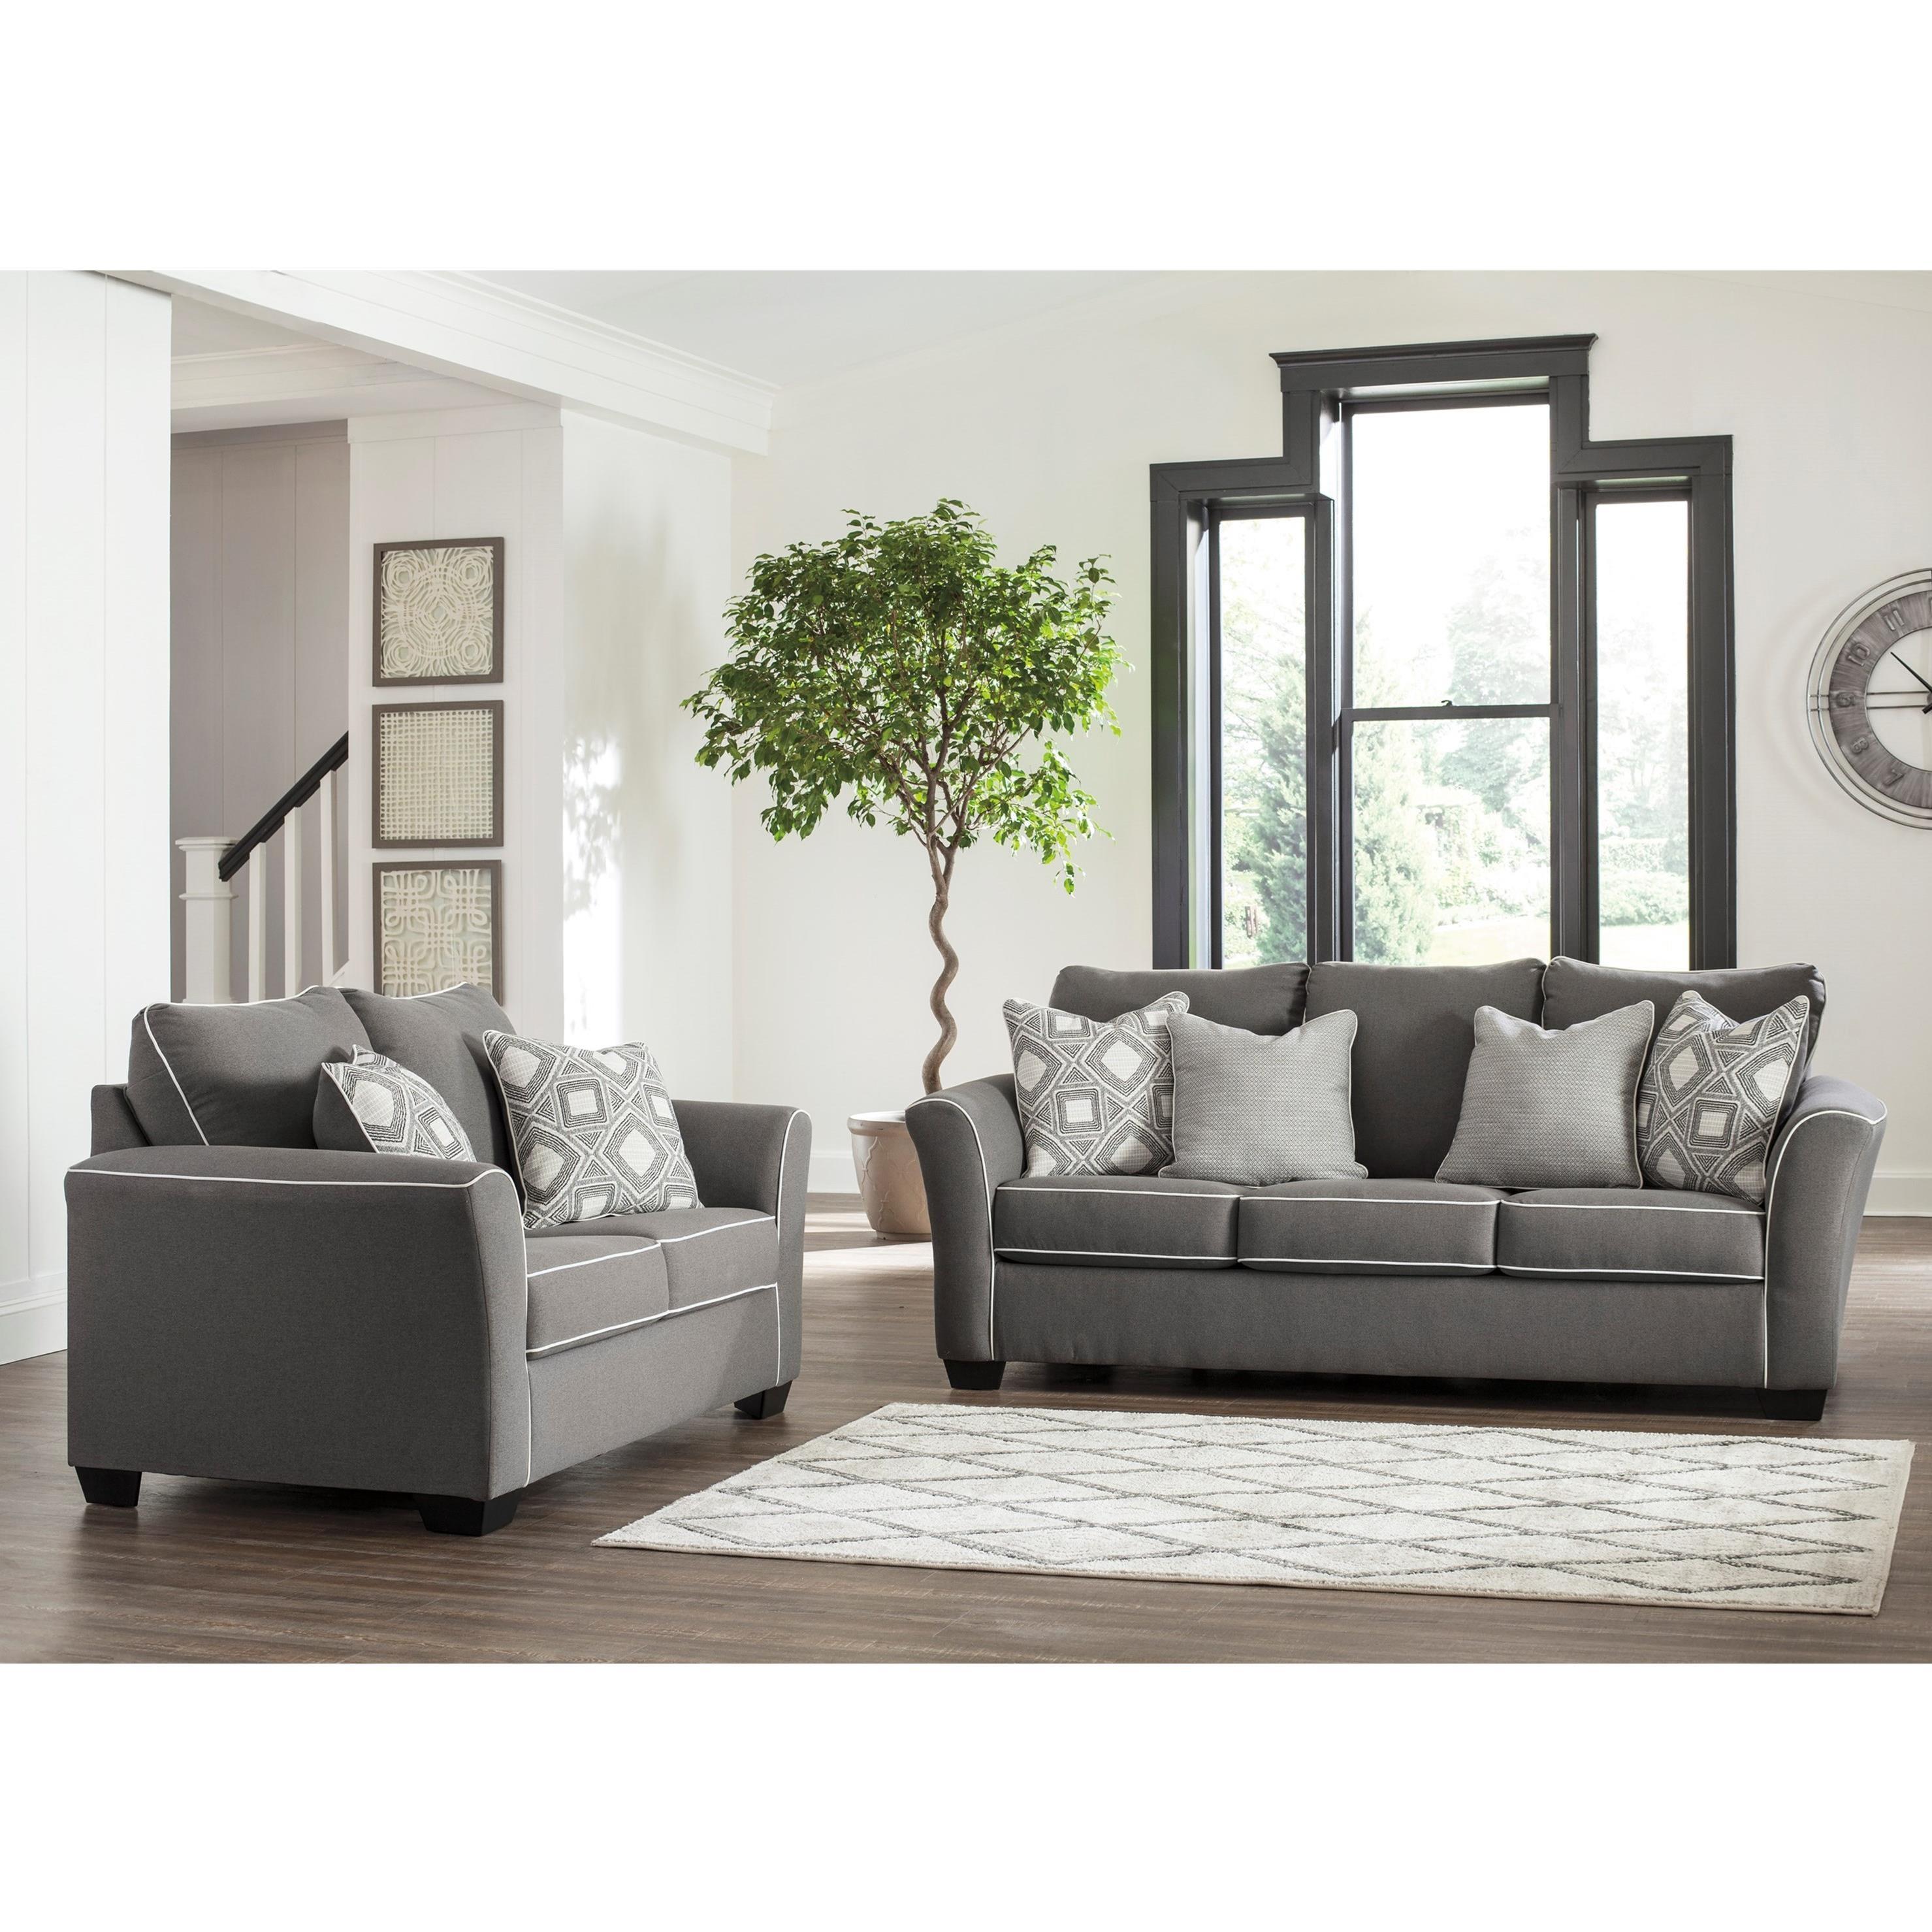 Signature Design Domani Stationary Living Room Group